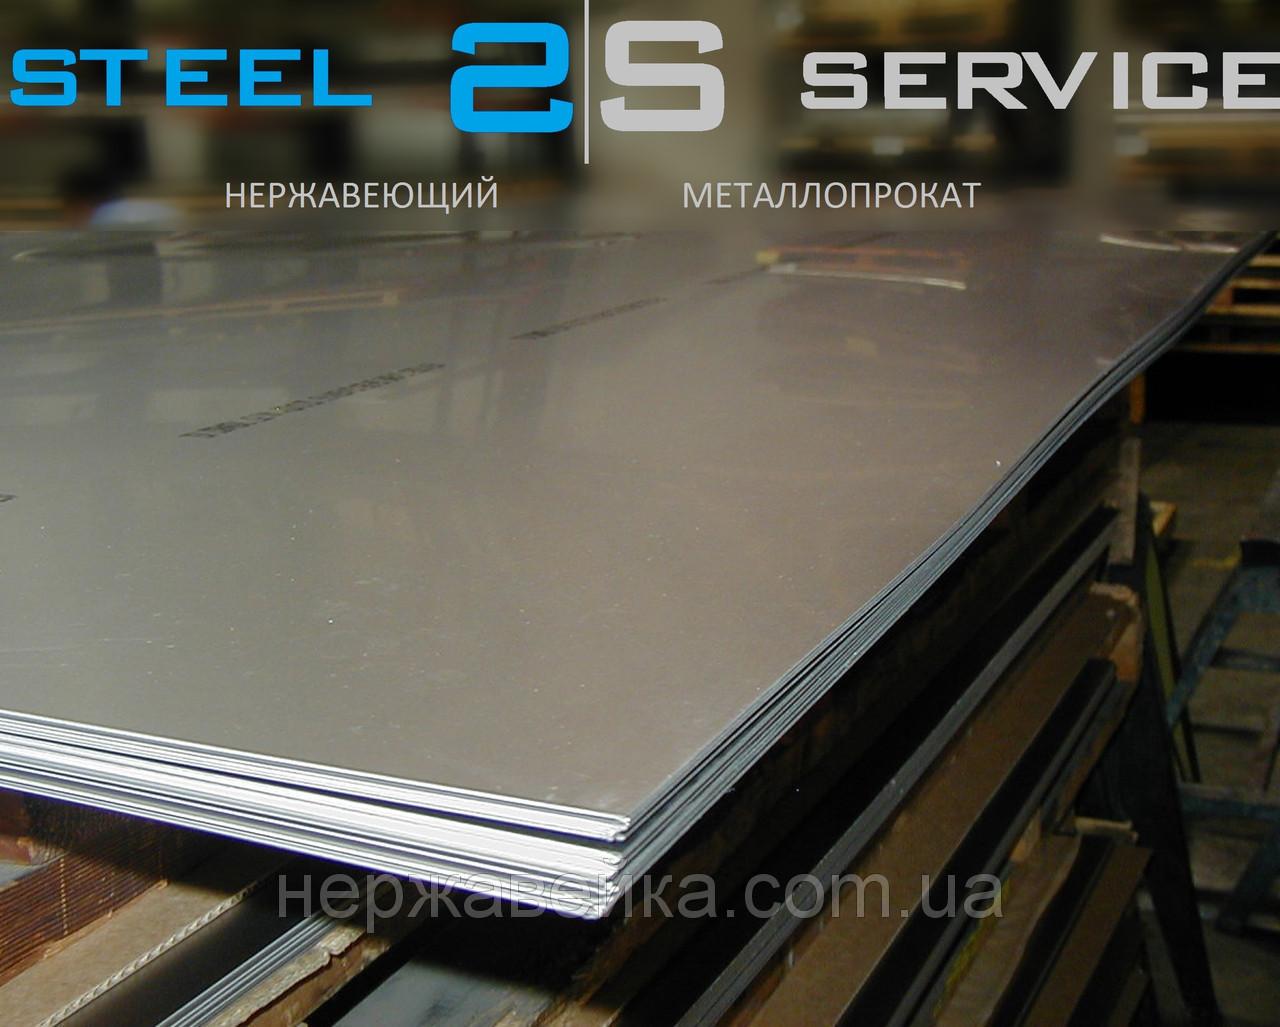 Нержавейка лист 0,5х1250х2500мм  AISI 316Ti(10Х17Н13М2Т) 2B - матовый,  кислотостойкий